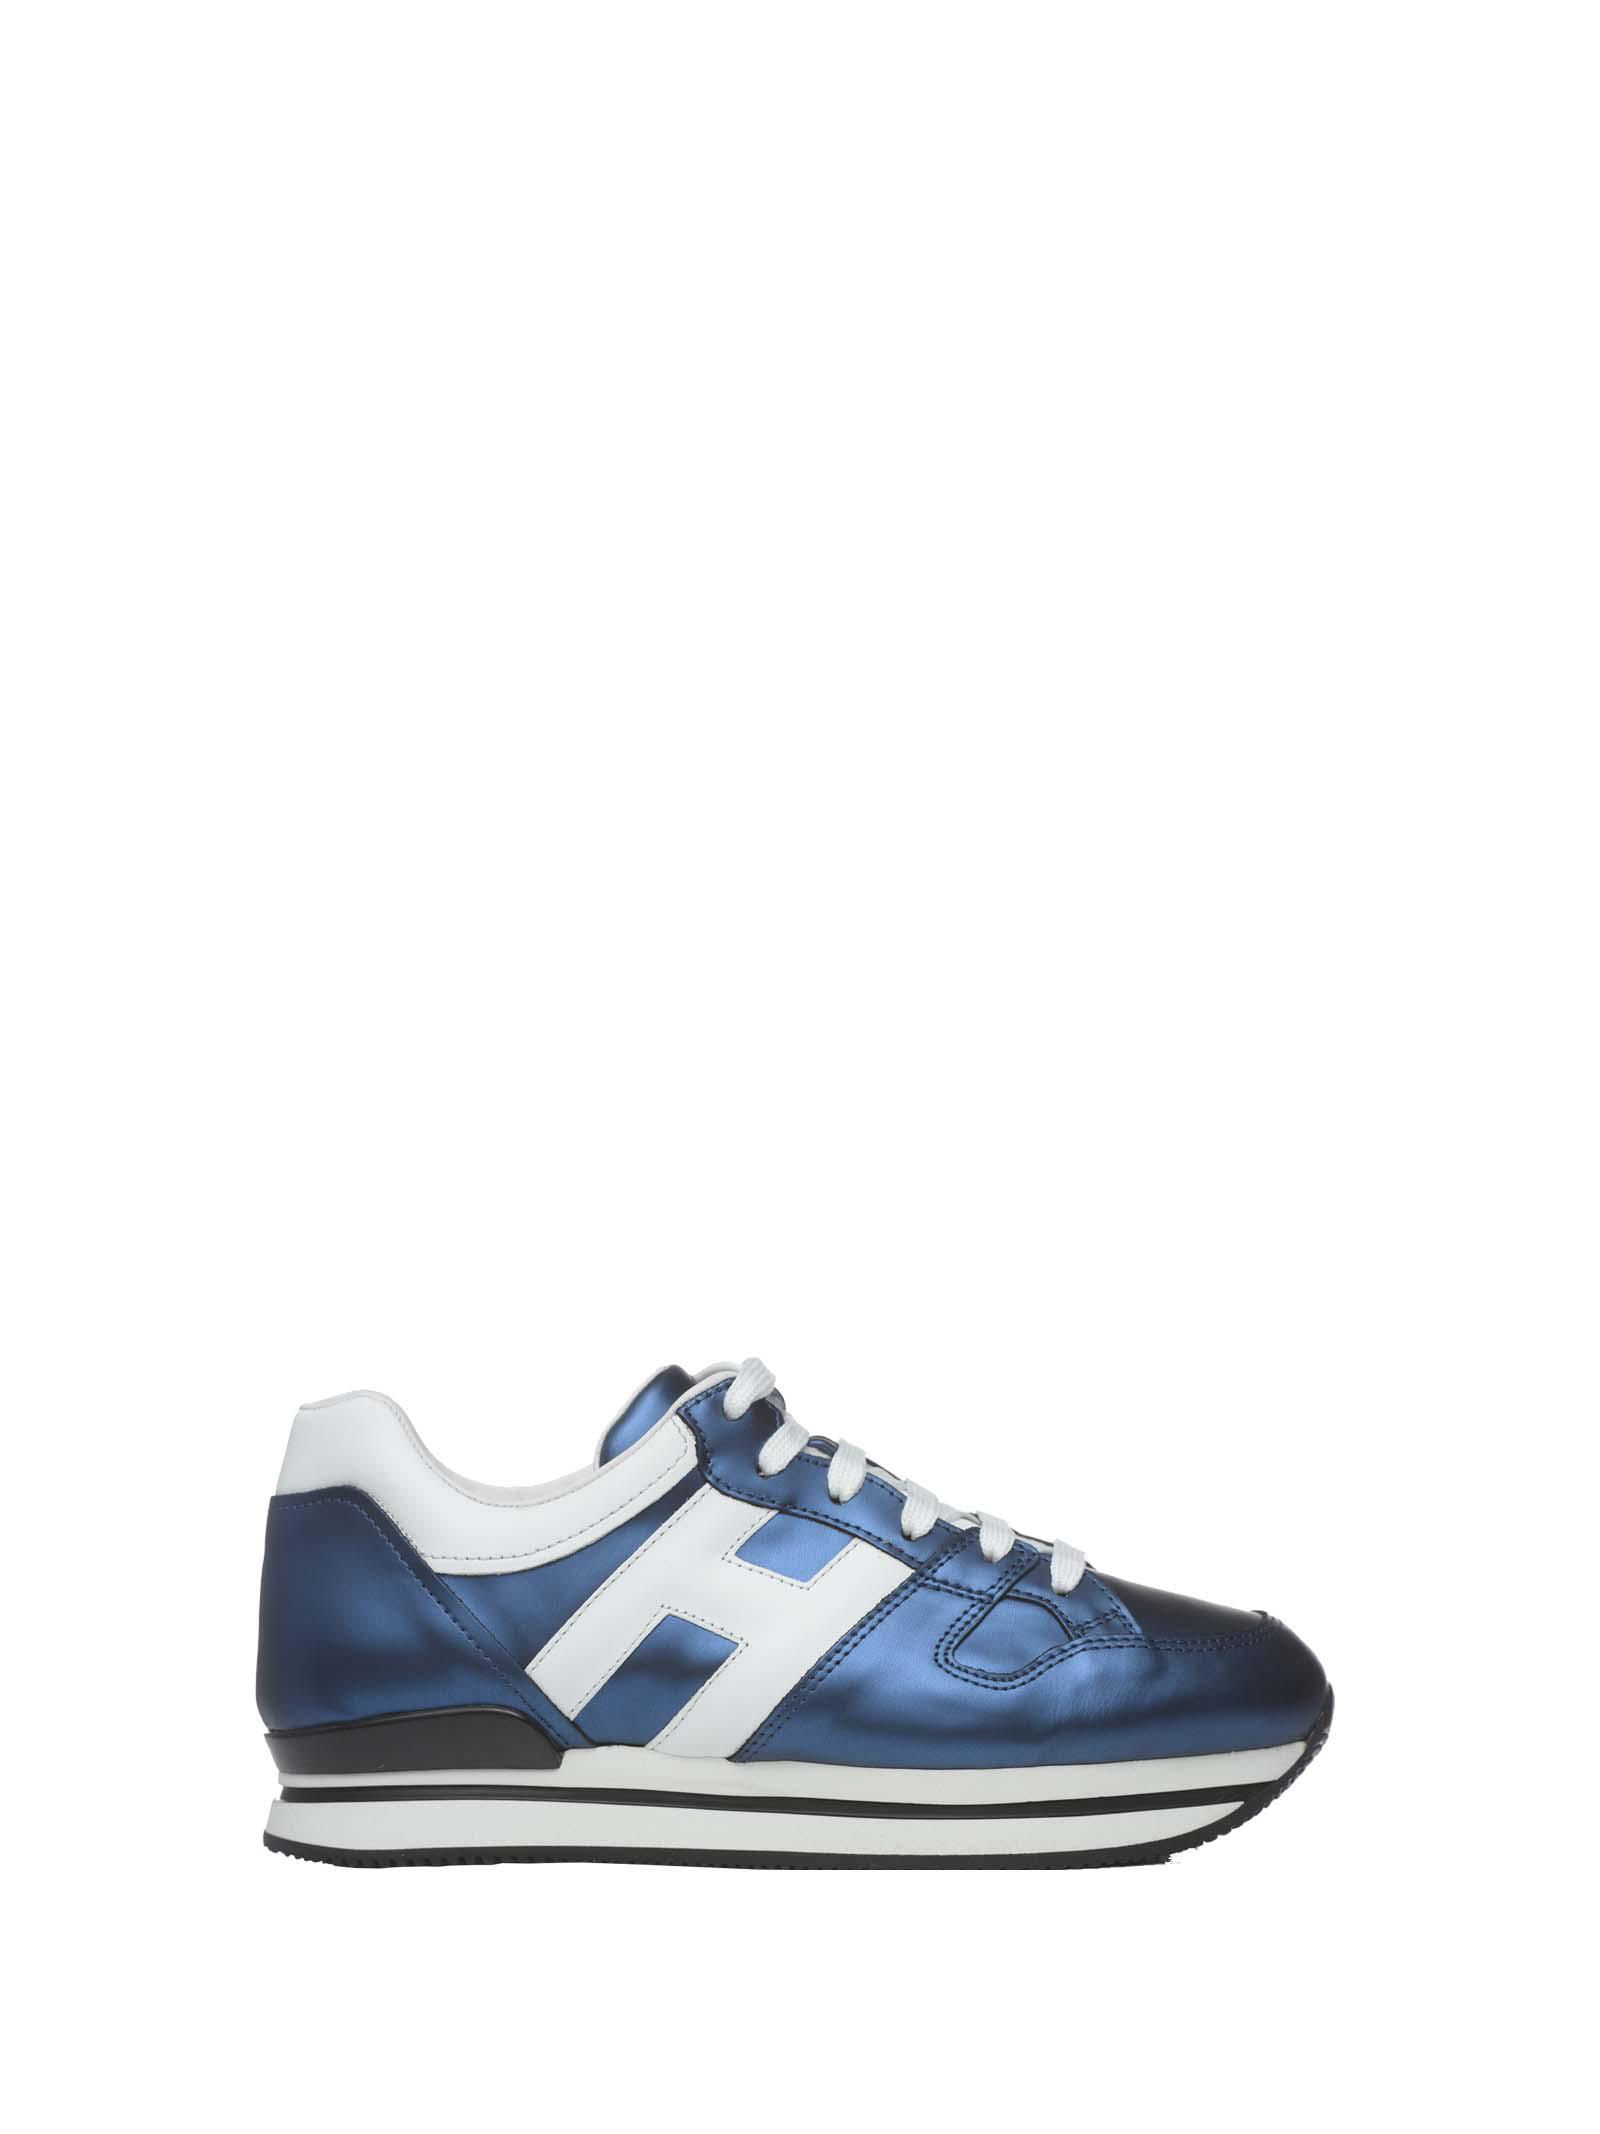 Hogan H222 Sneakers In Blu Chiaro Bianco   ModeSens